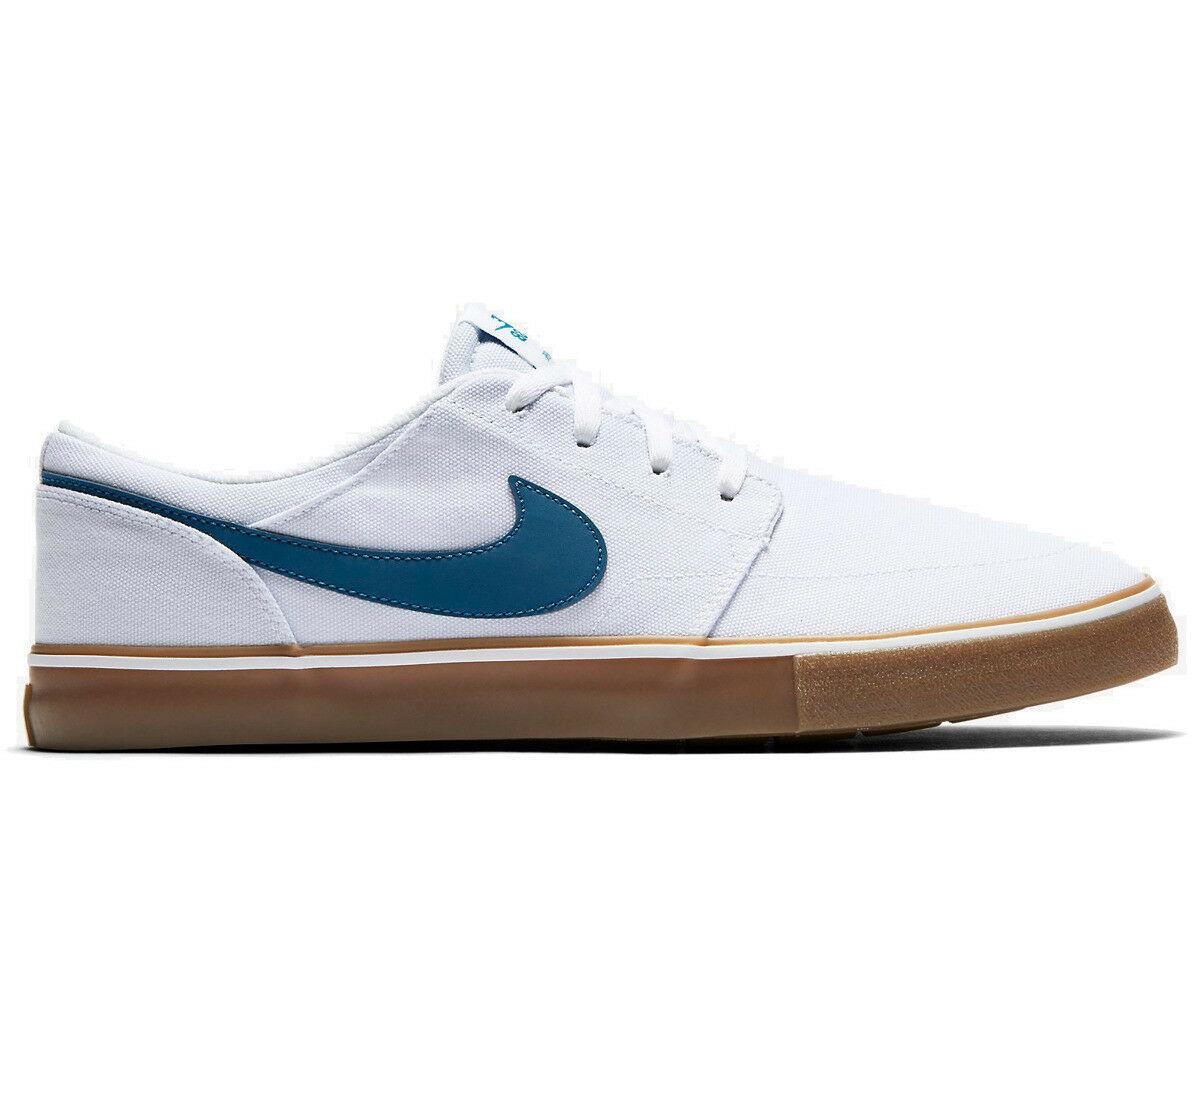 Nike SB Portmore II Solar CNVS Canvas White/Blue Mens Skate Shoes 880268-149